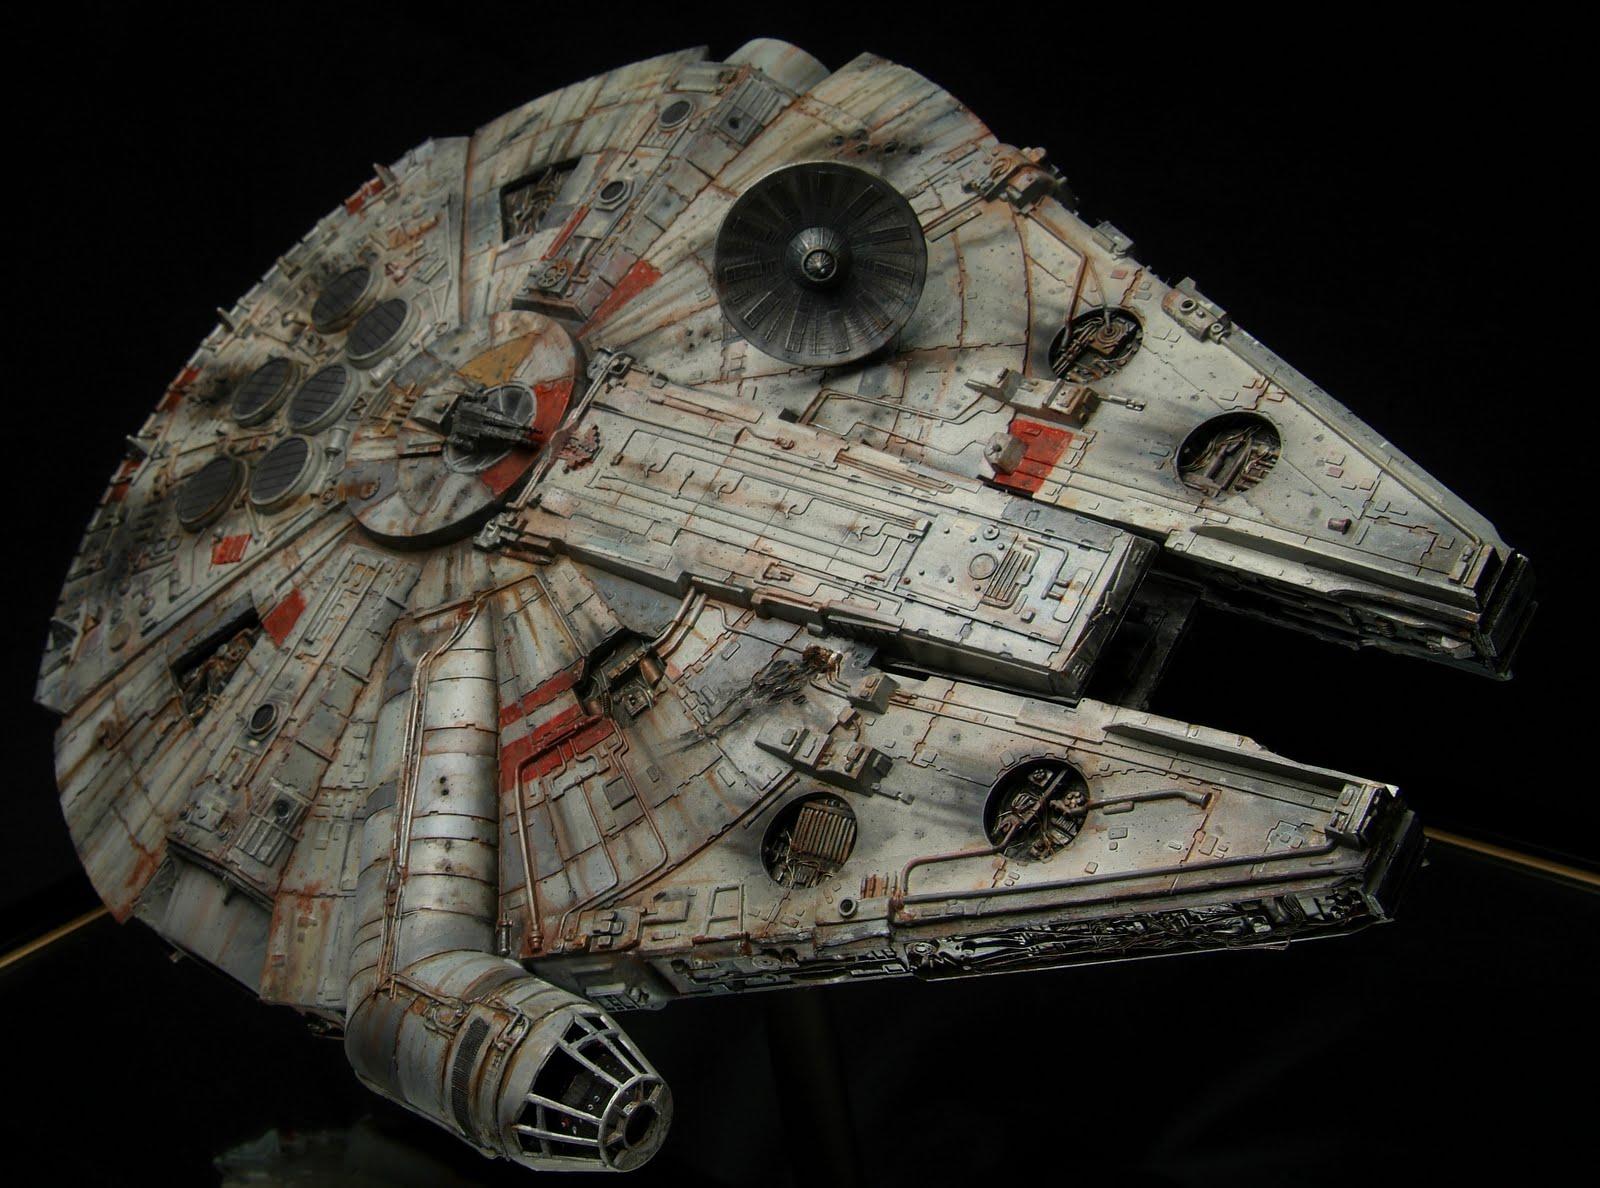 star wars millenium falcon - photo #24